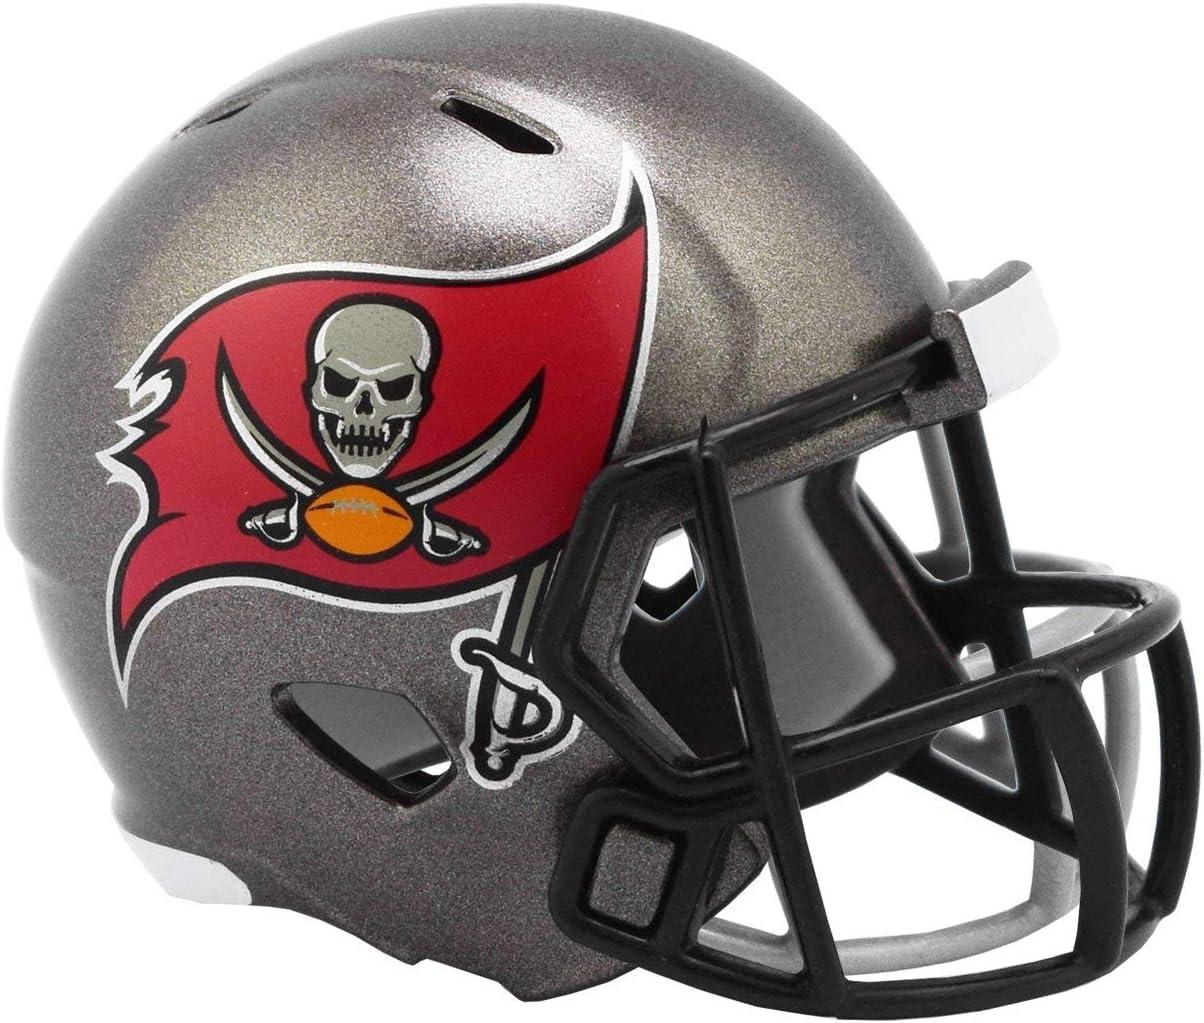 Riddell Tampa Bay Buccaneers 2020 NFL Revolution Speed Mini Pocket Pro Football Helmet